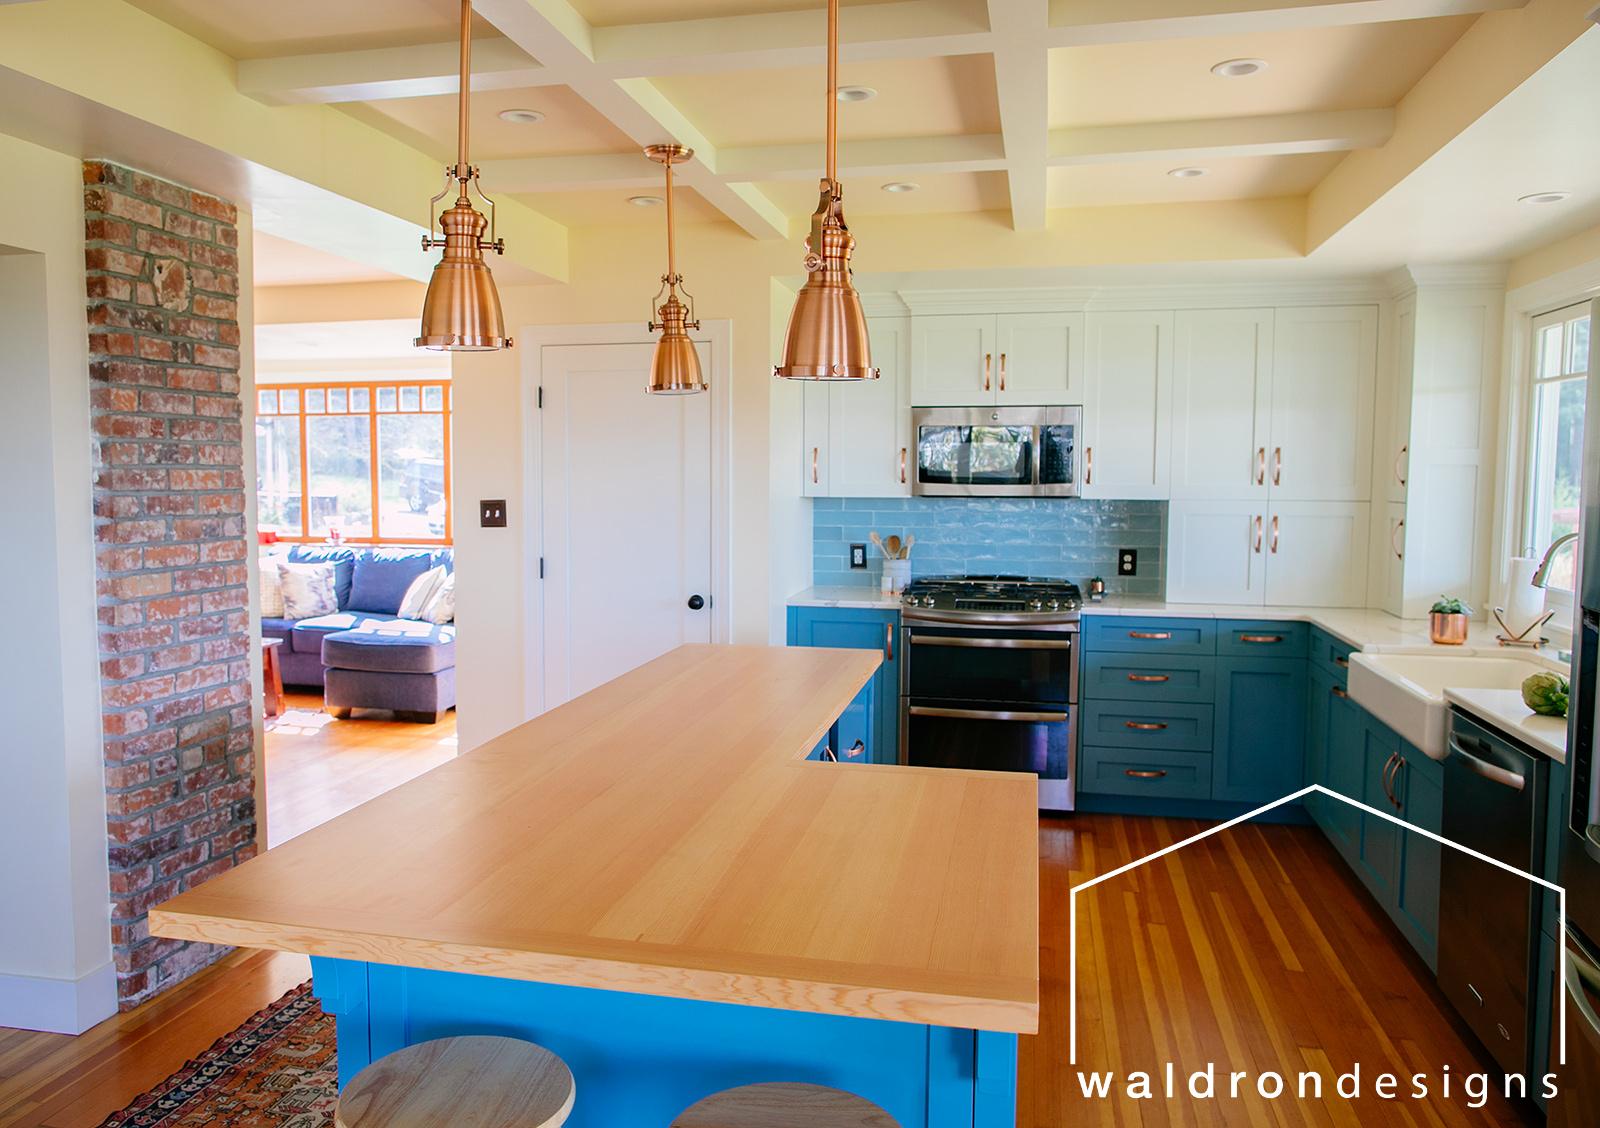 vashon-seattle-tacoma-interior-architectural-designer-waldron-designs-benjamin-moore-cloud-white-cabinets.jpg